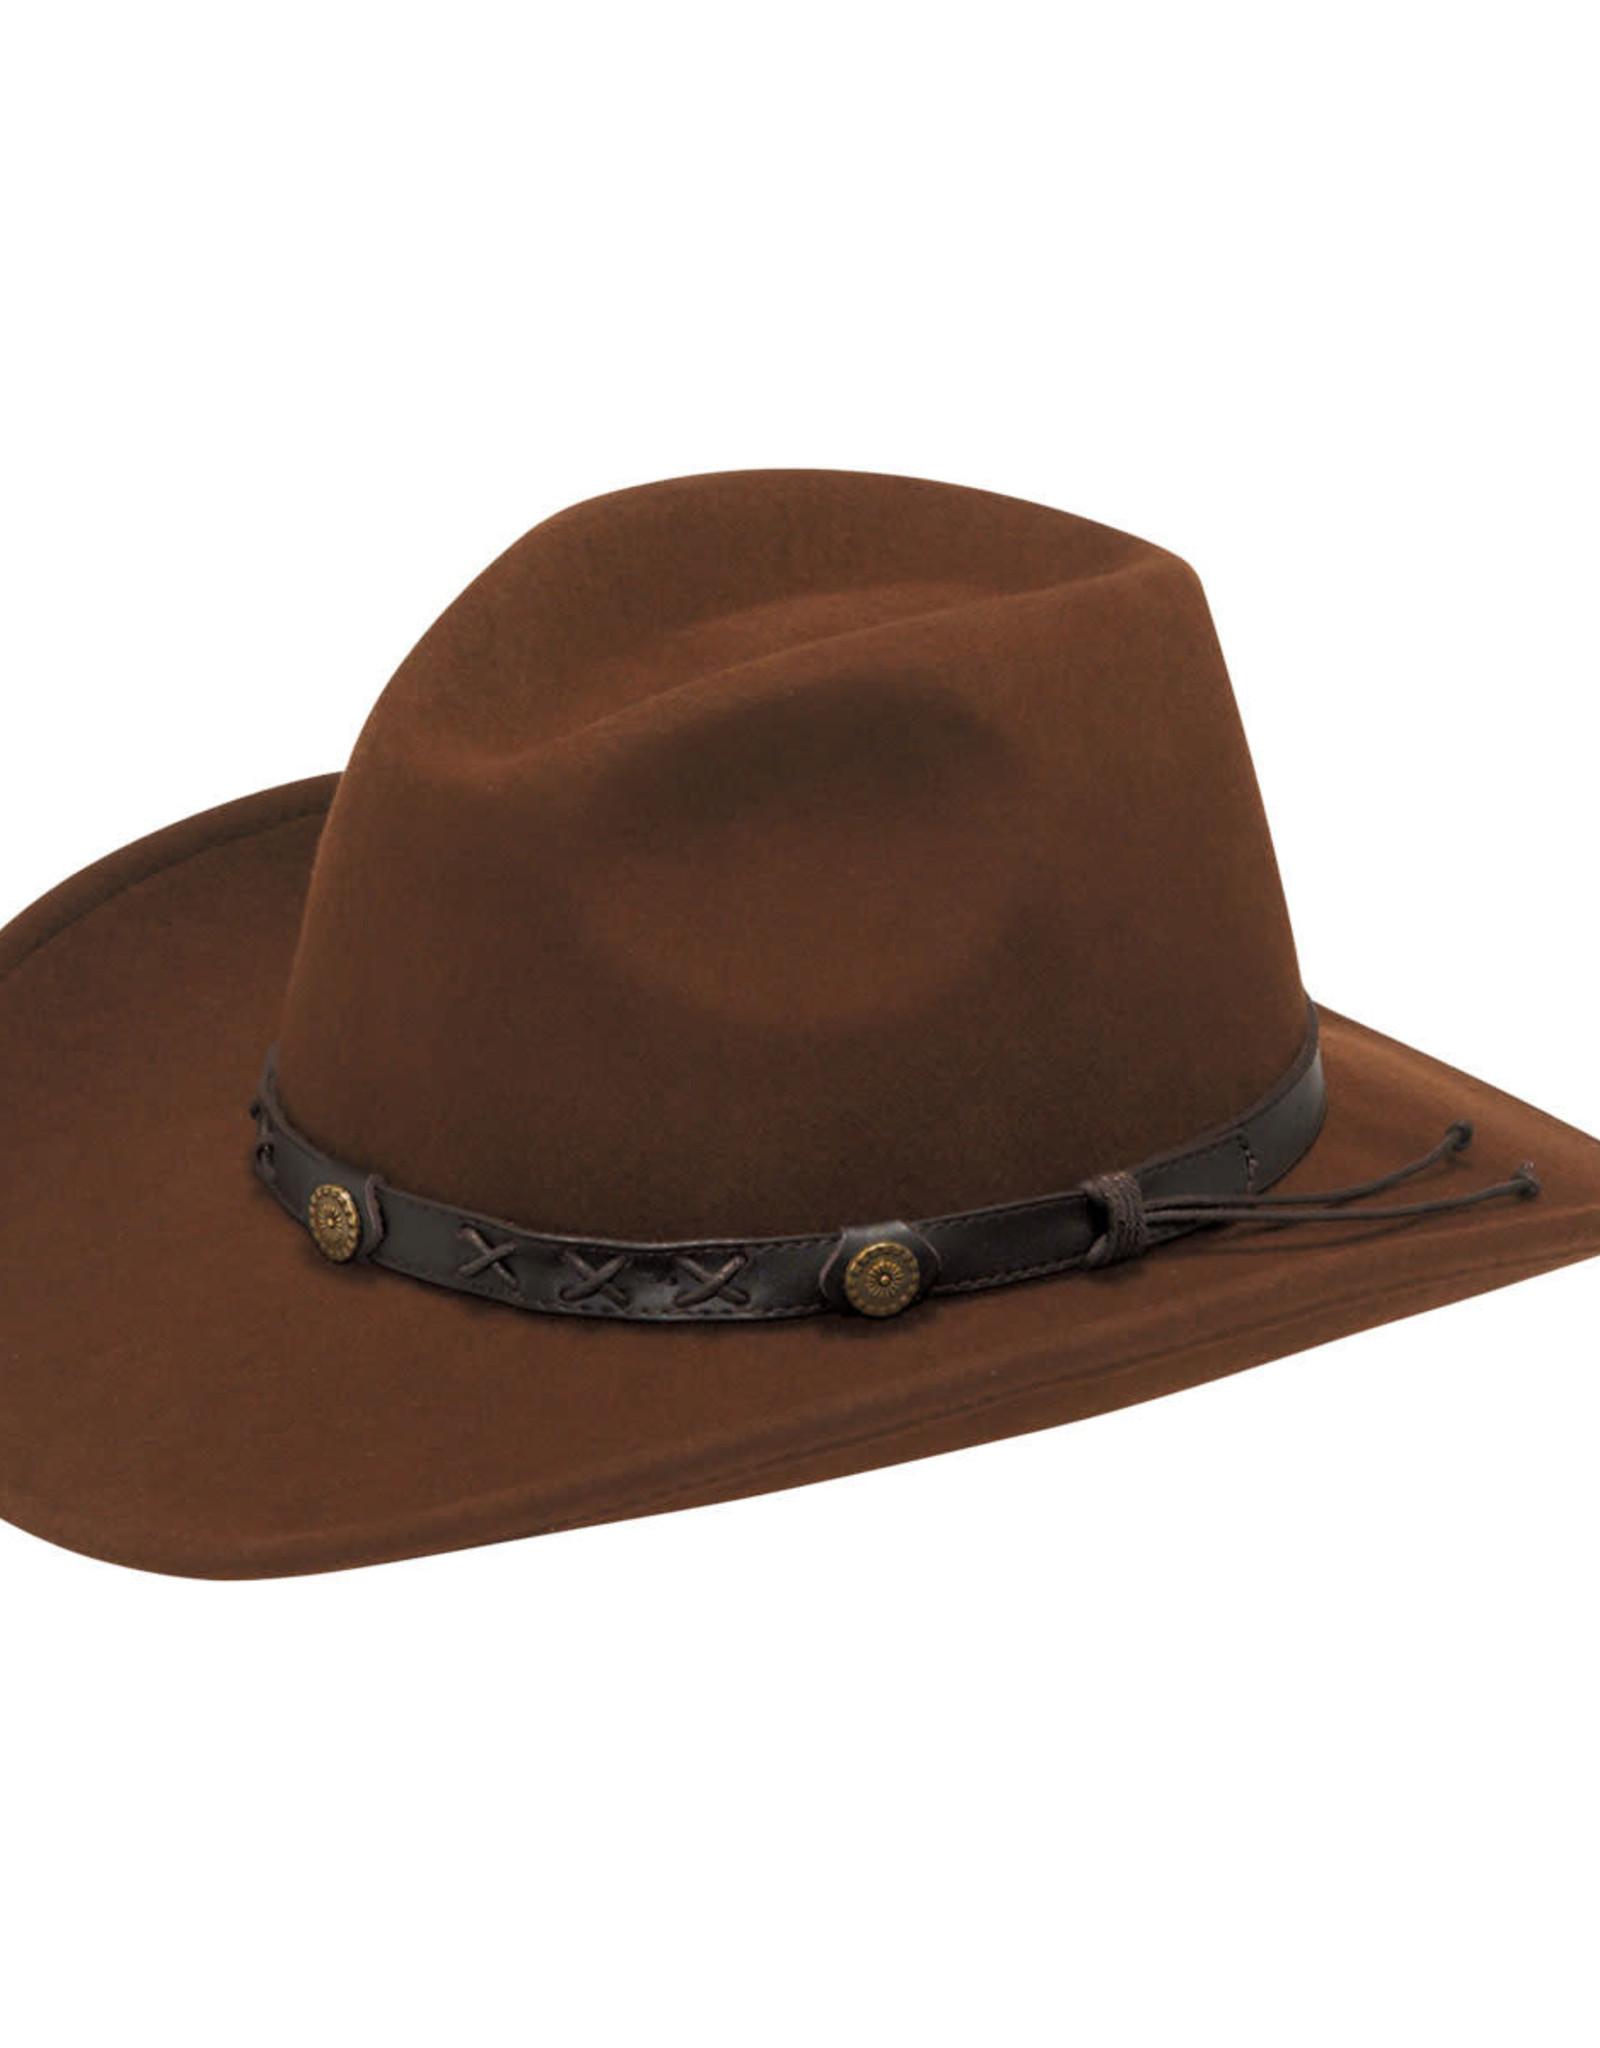 Twister Dakota Chestnut Brown Crushable Wool Cowboy Hat